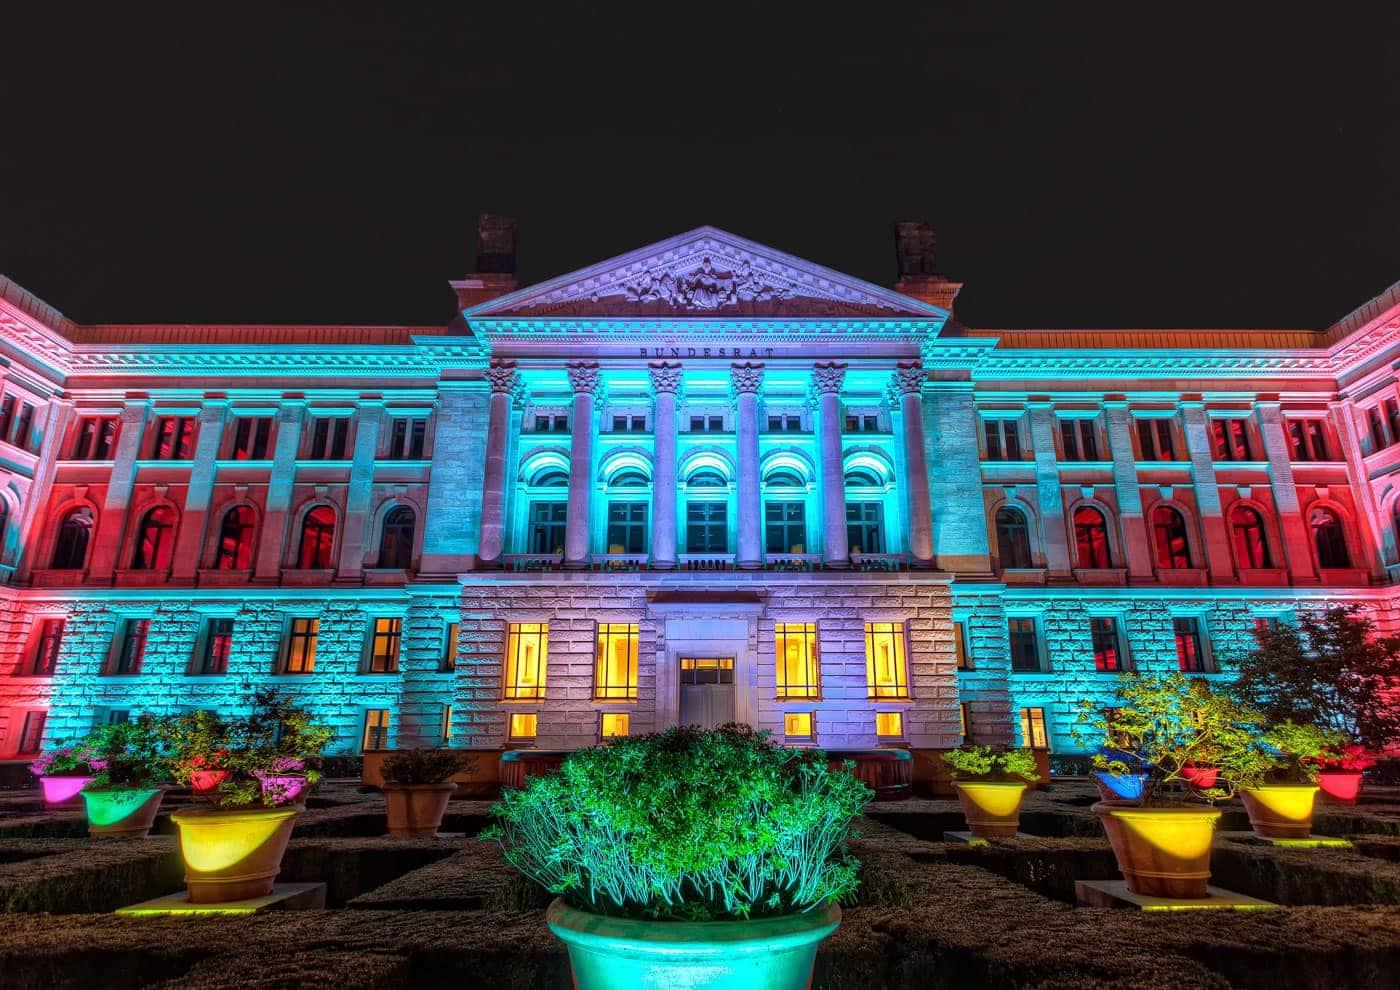 Bundesrat | Berlin, Germany